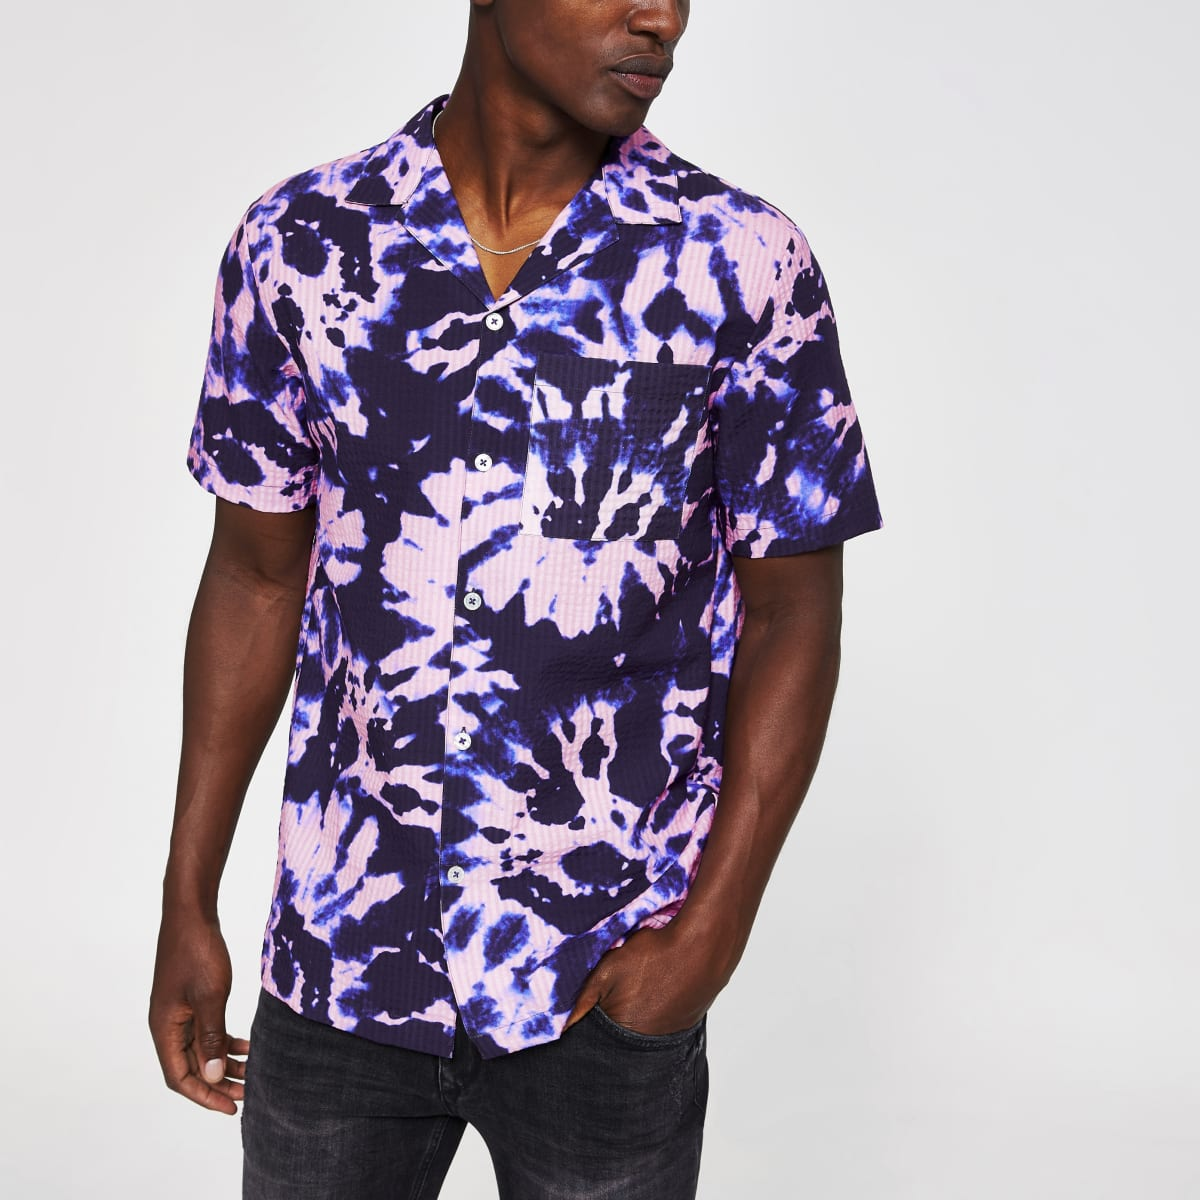 Purple tie dye chest pocket shirt